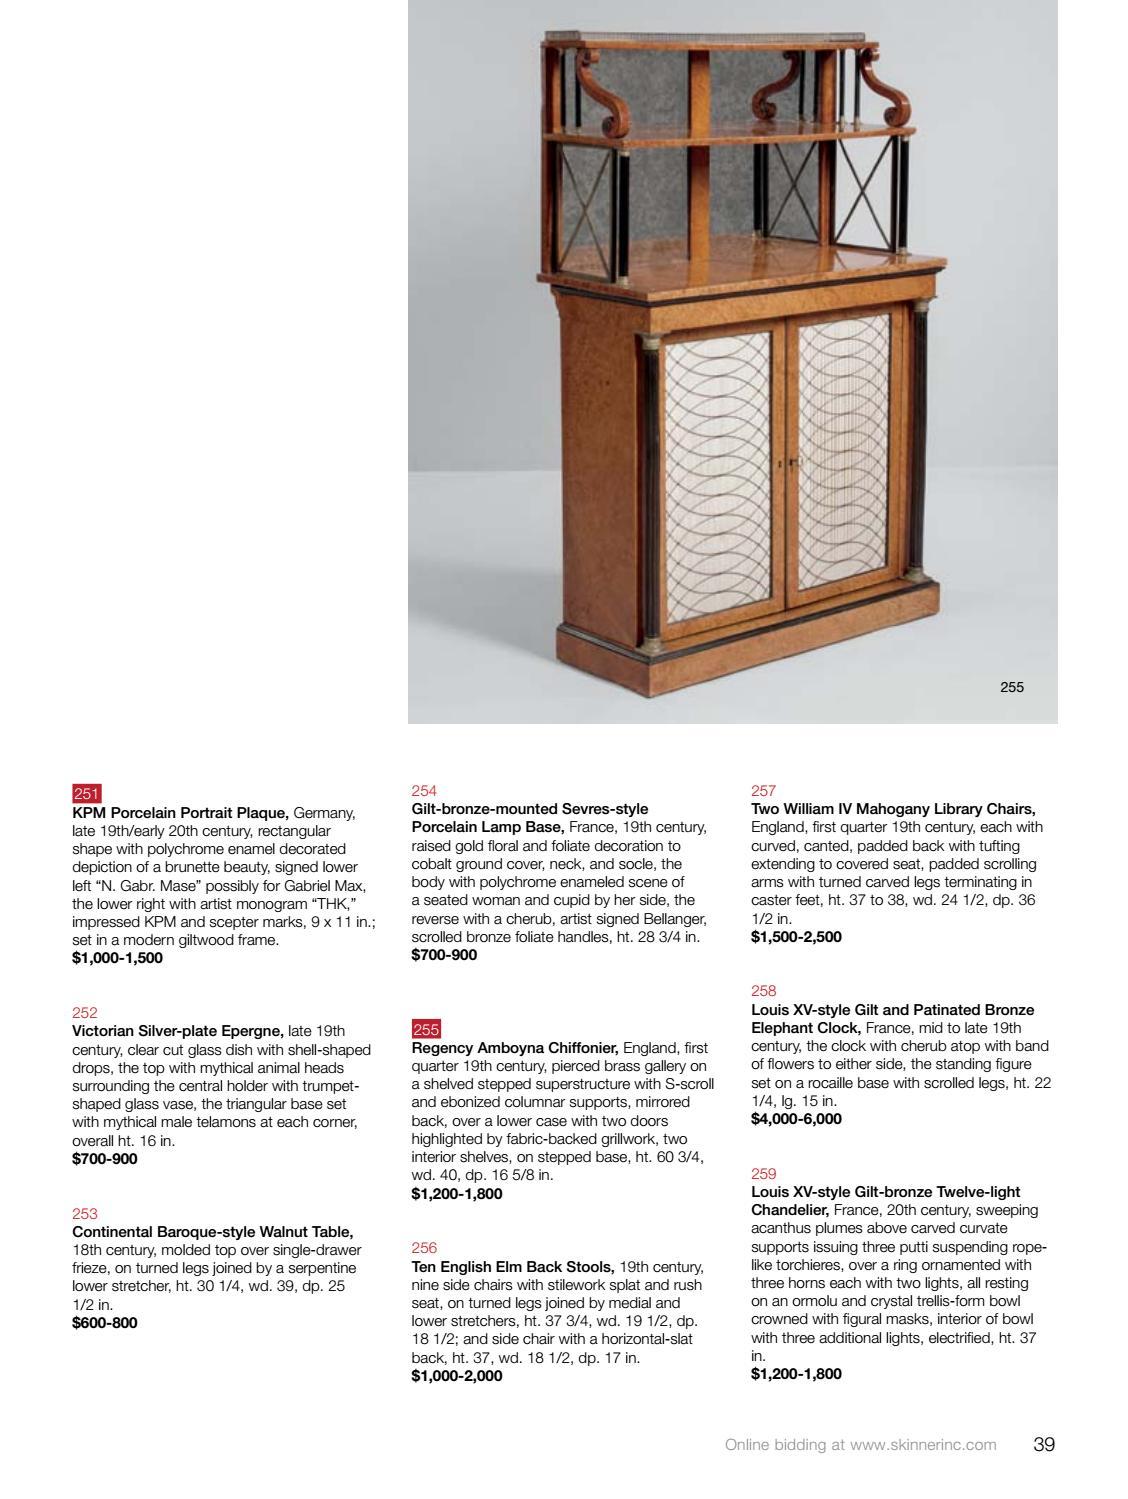 European Furniture & Decorative Arts | Skinner Auction 3000B